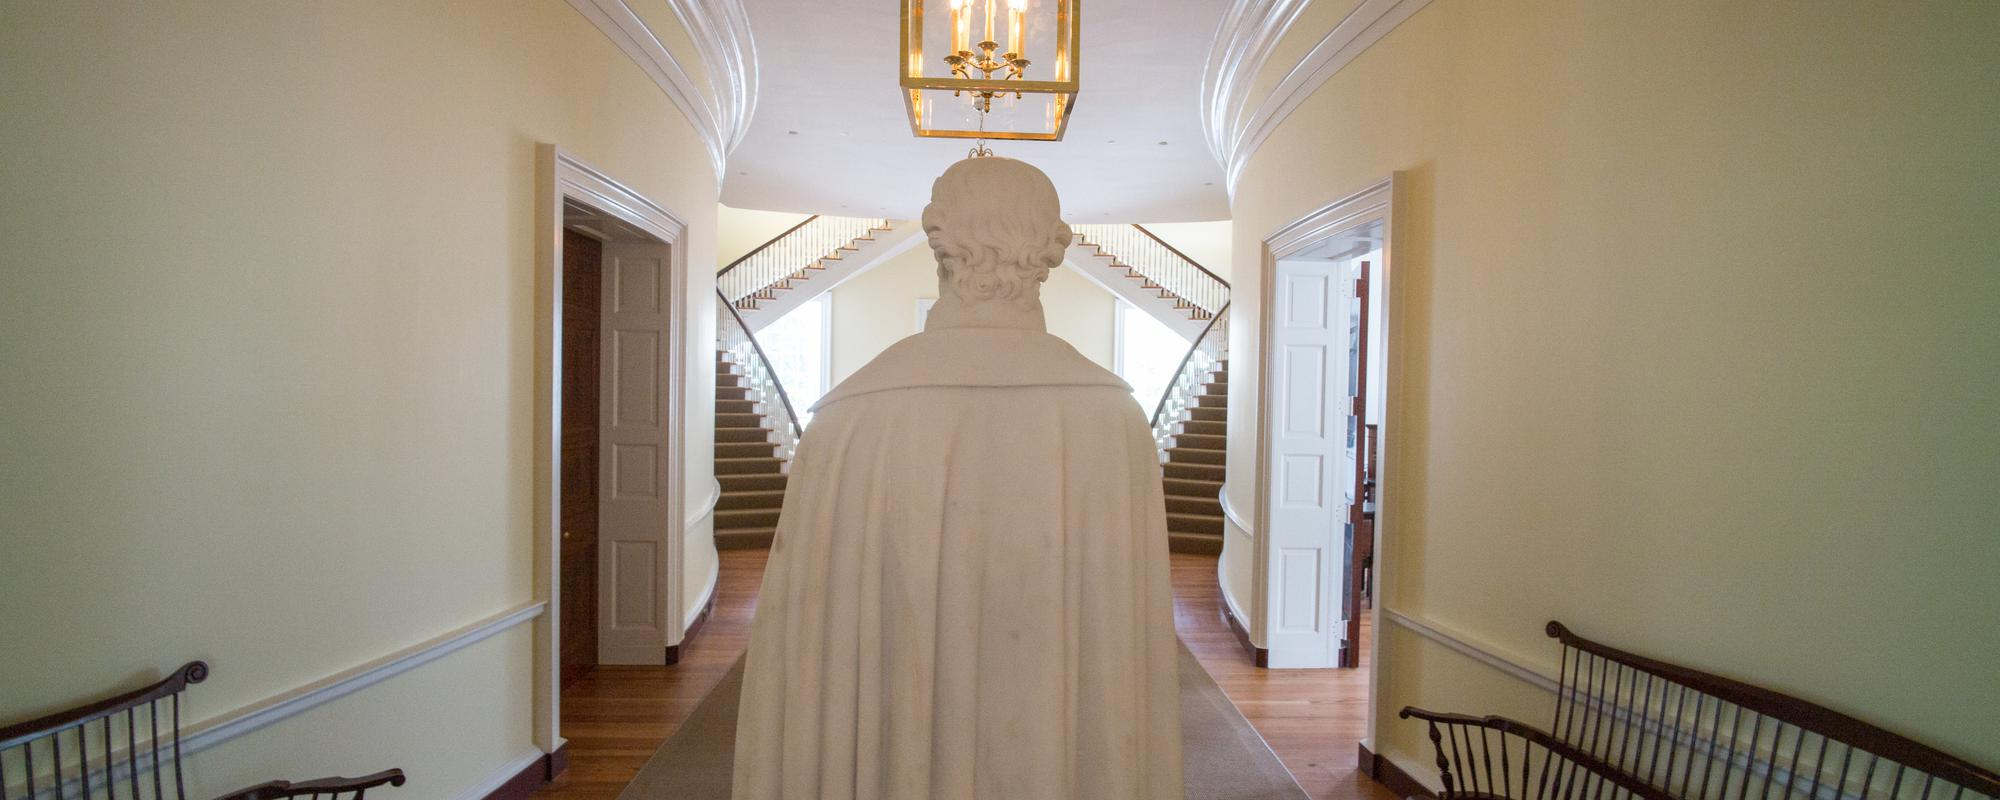 UVA Statue of Thomas Jefferson